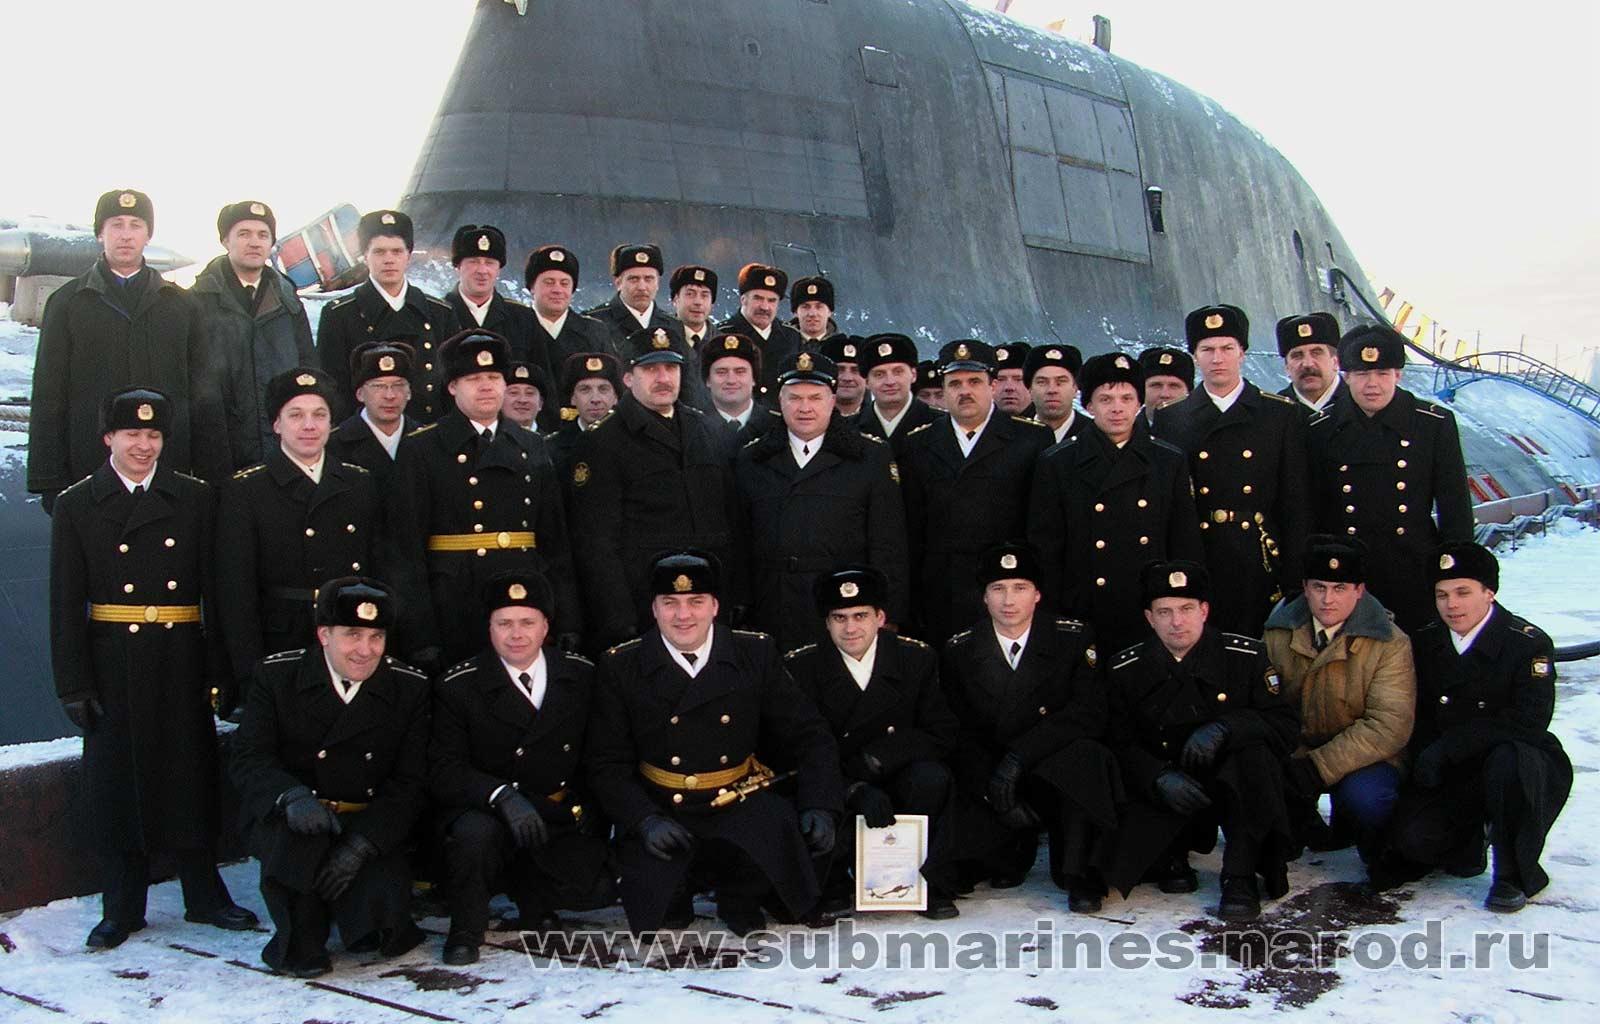 фото экипаж подводной лодки